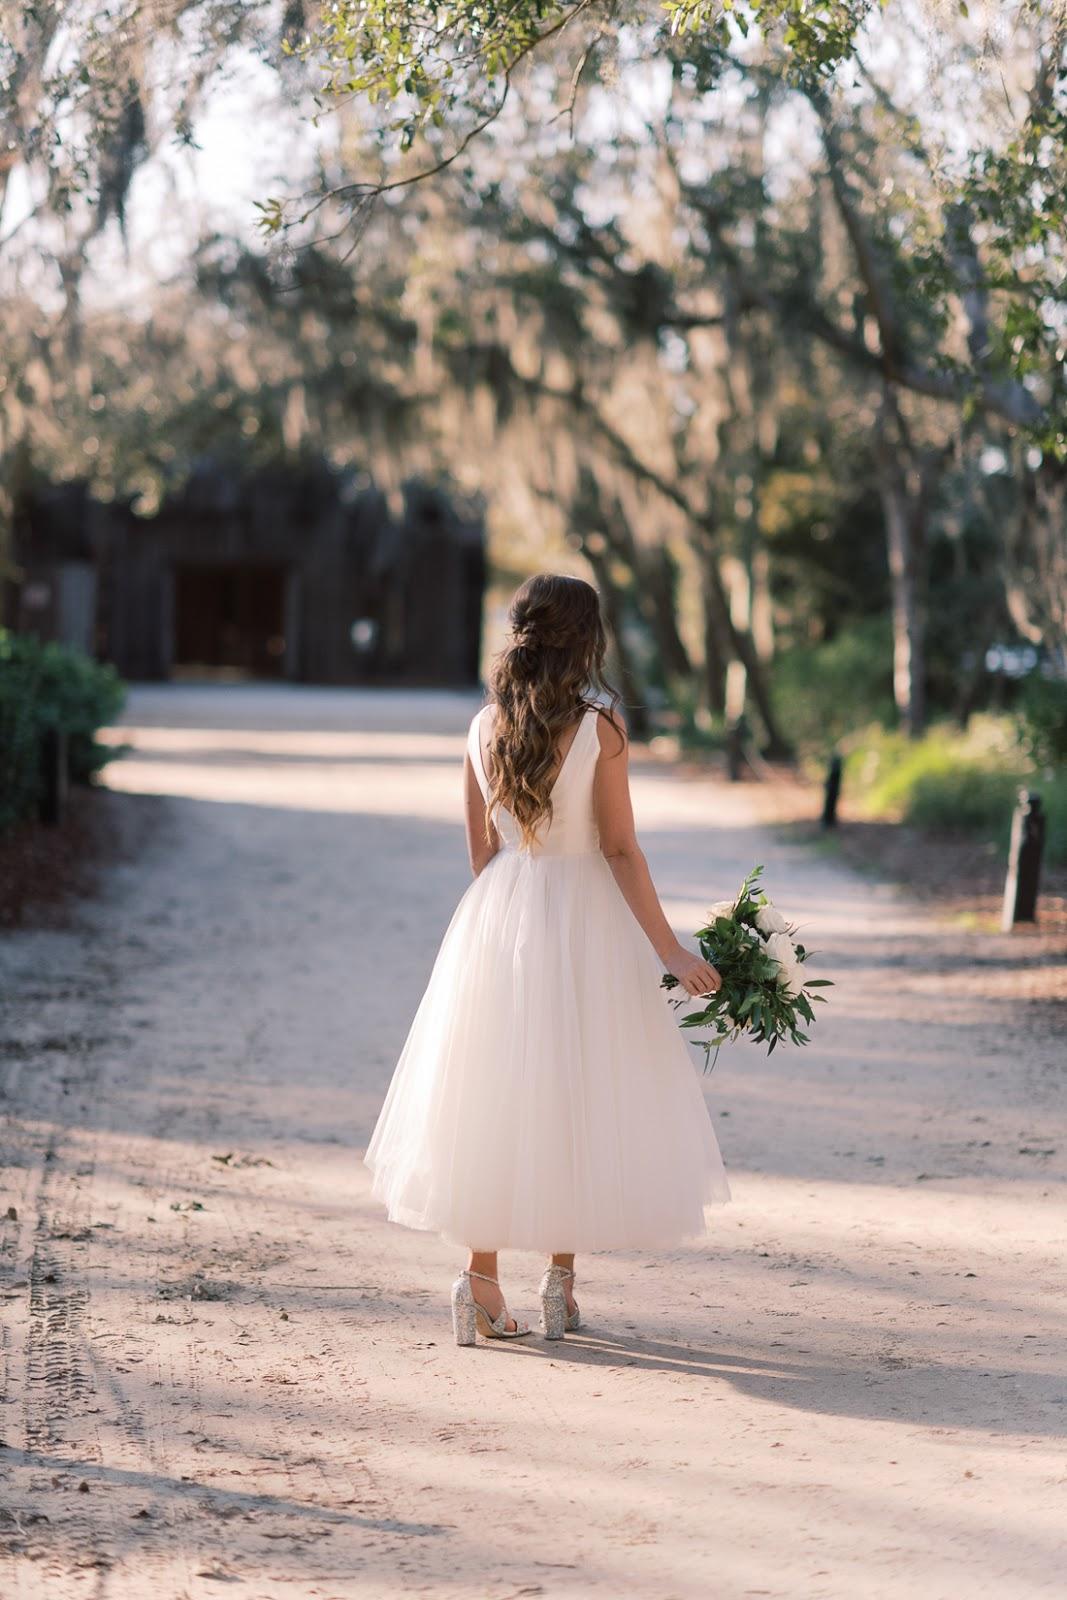 Wedding at Boone Hall Plantation - Chasing Cinderella